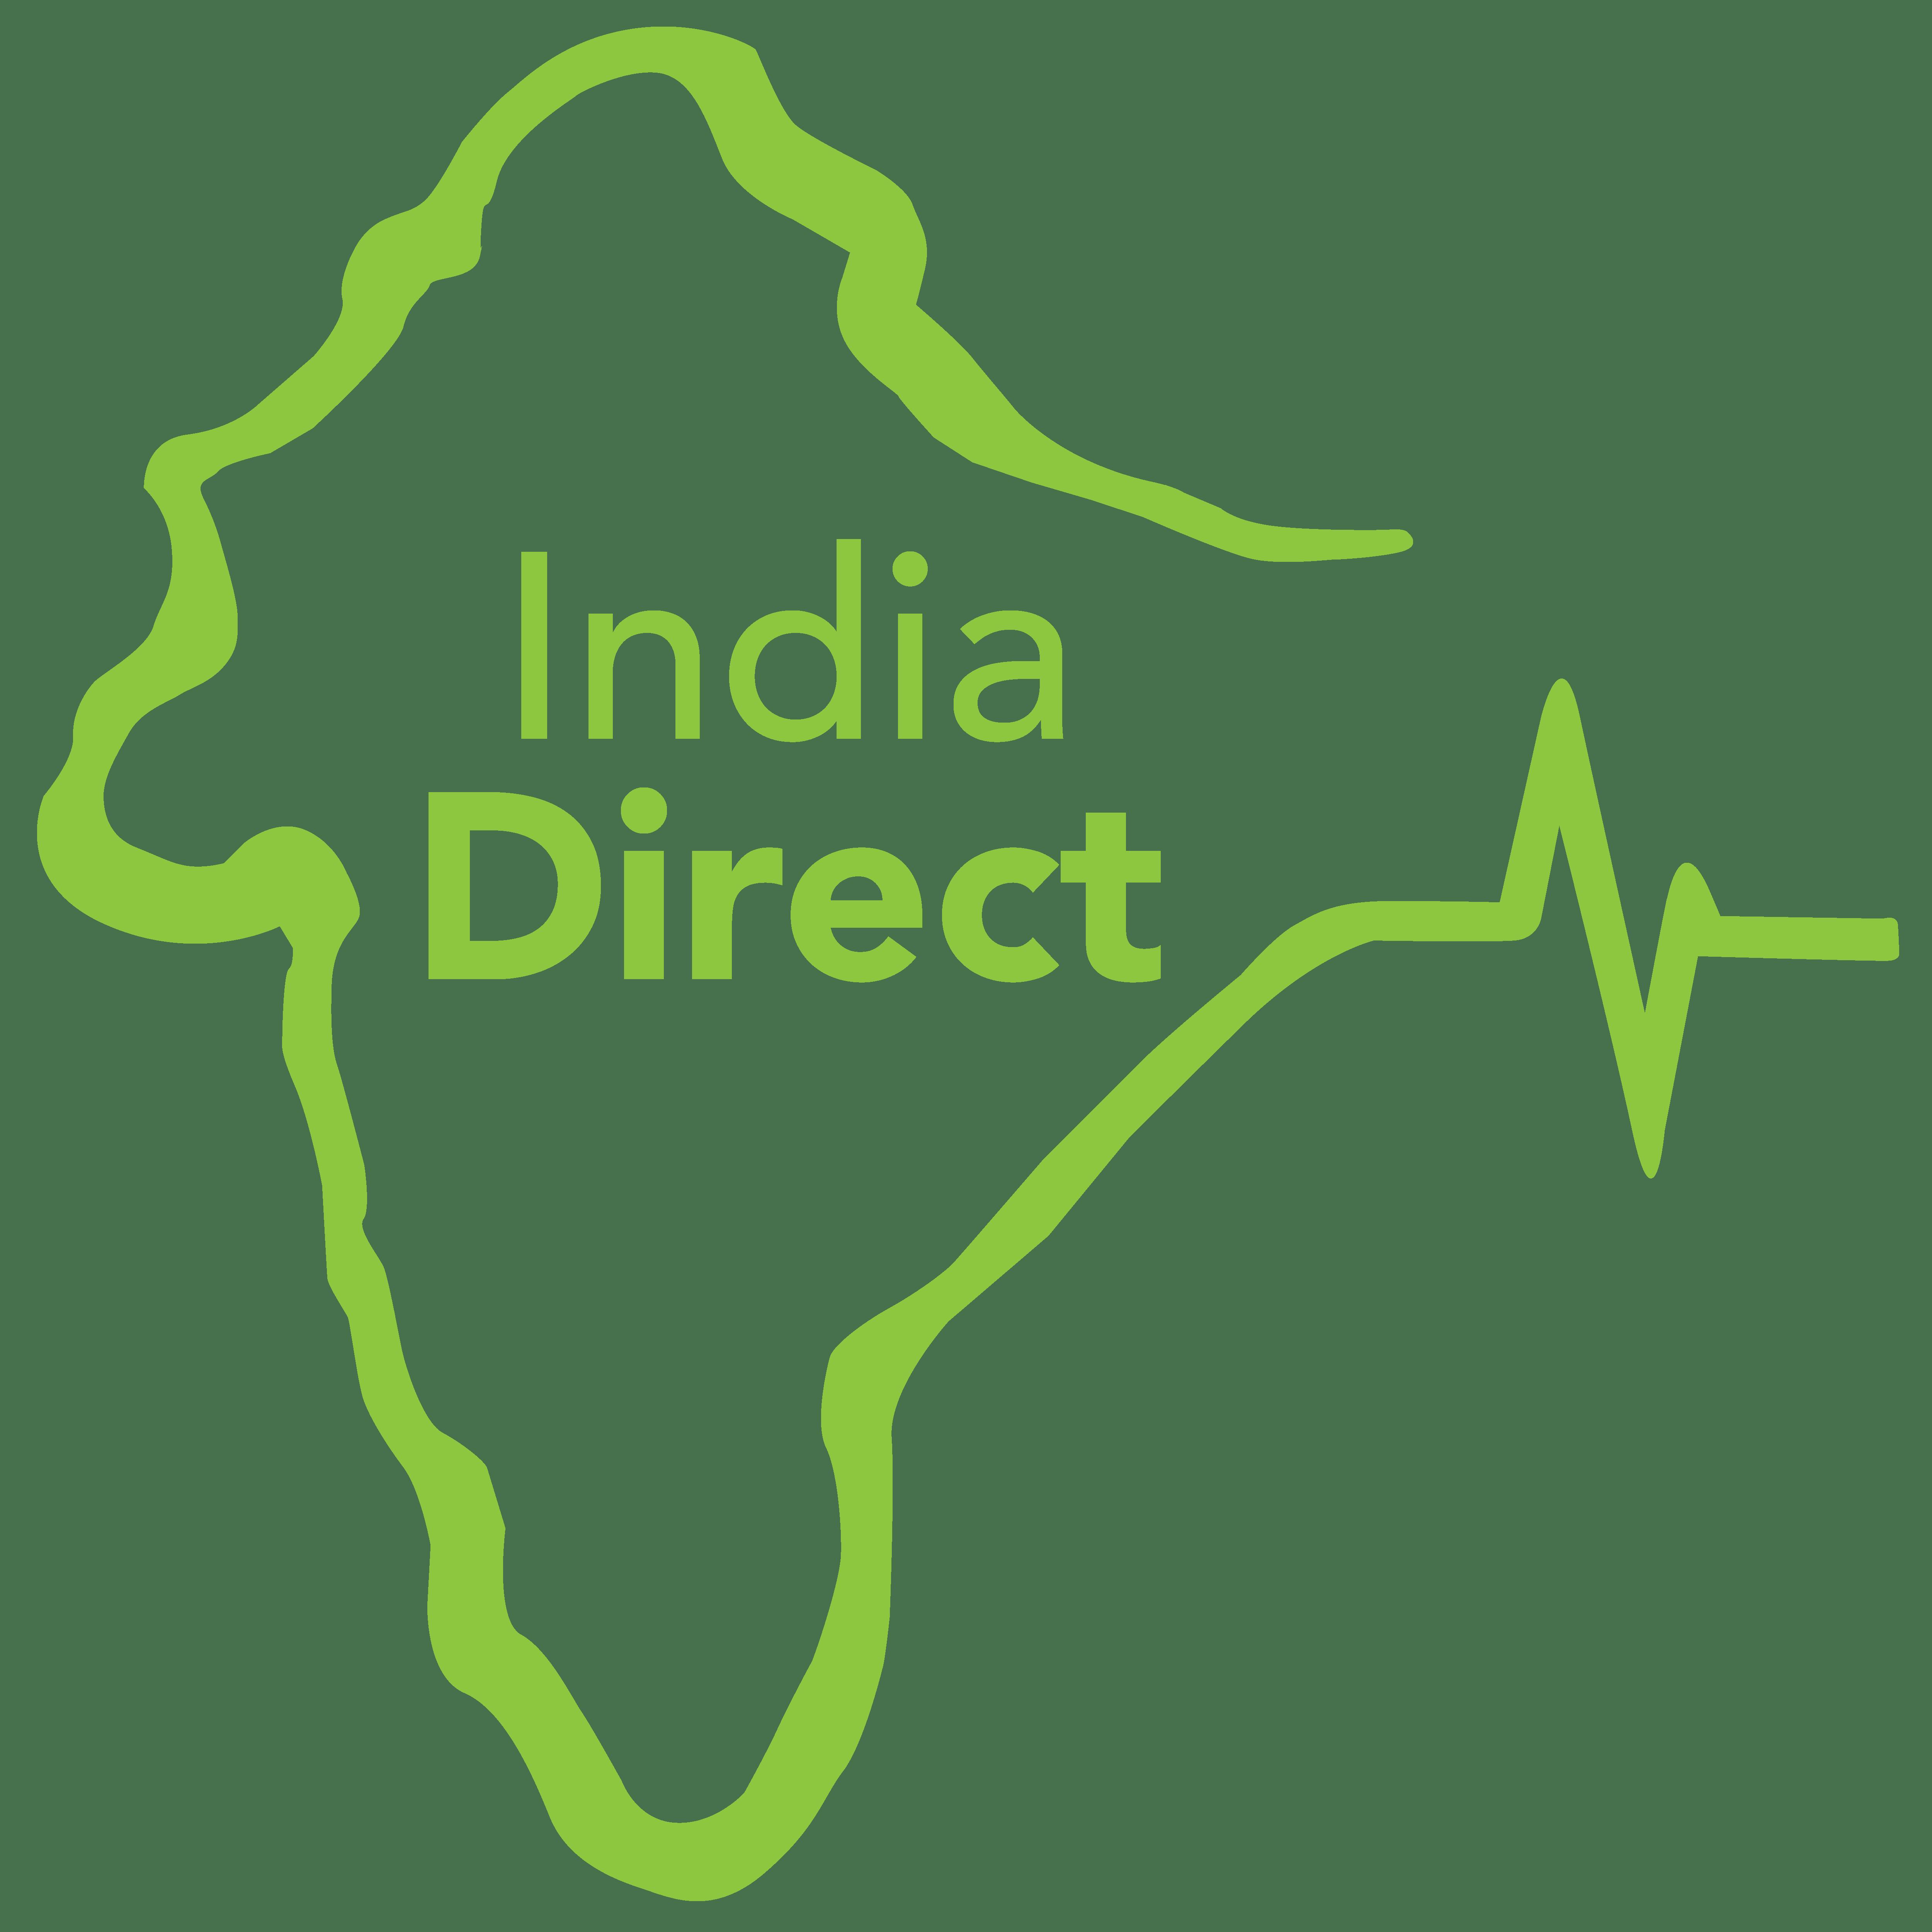 India Direct